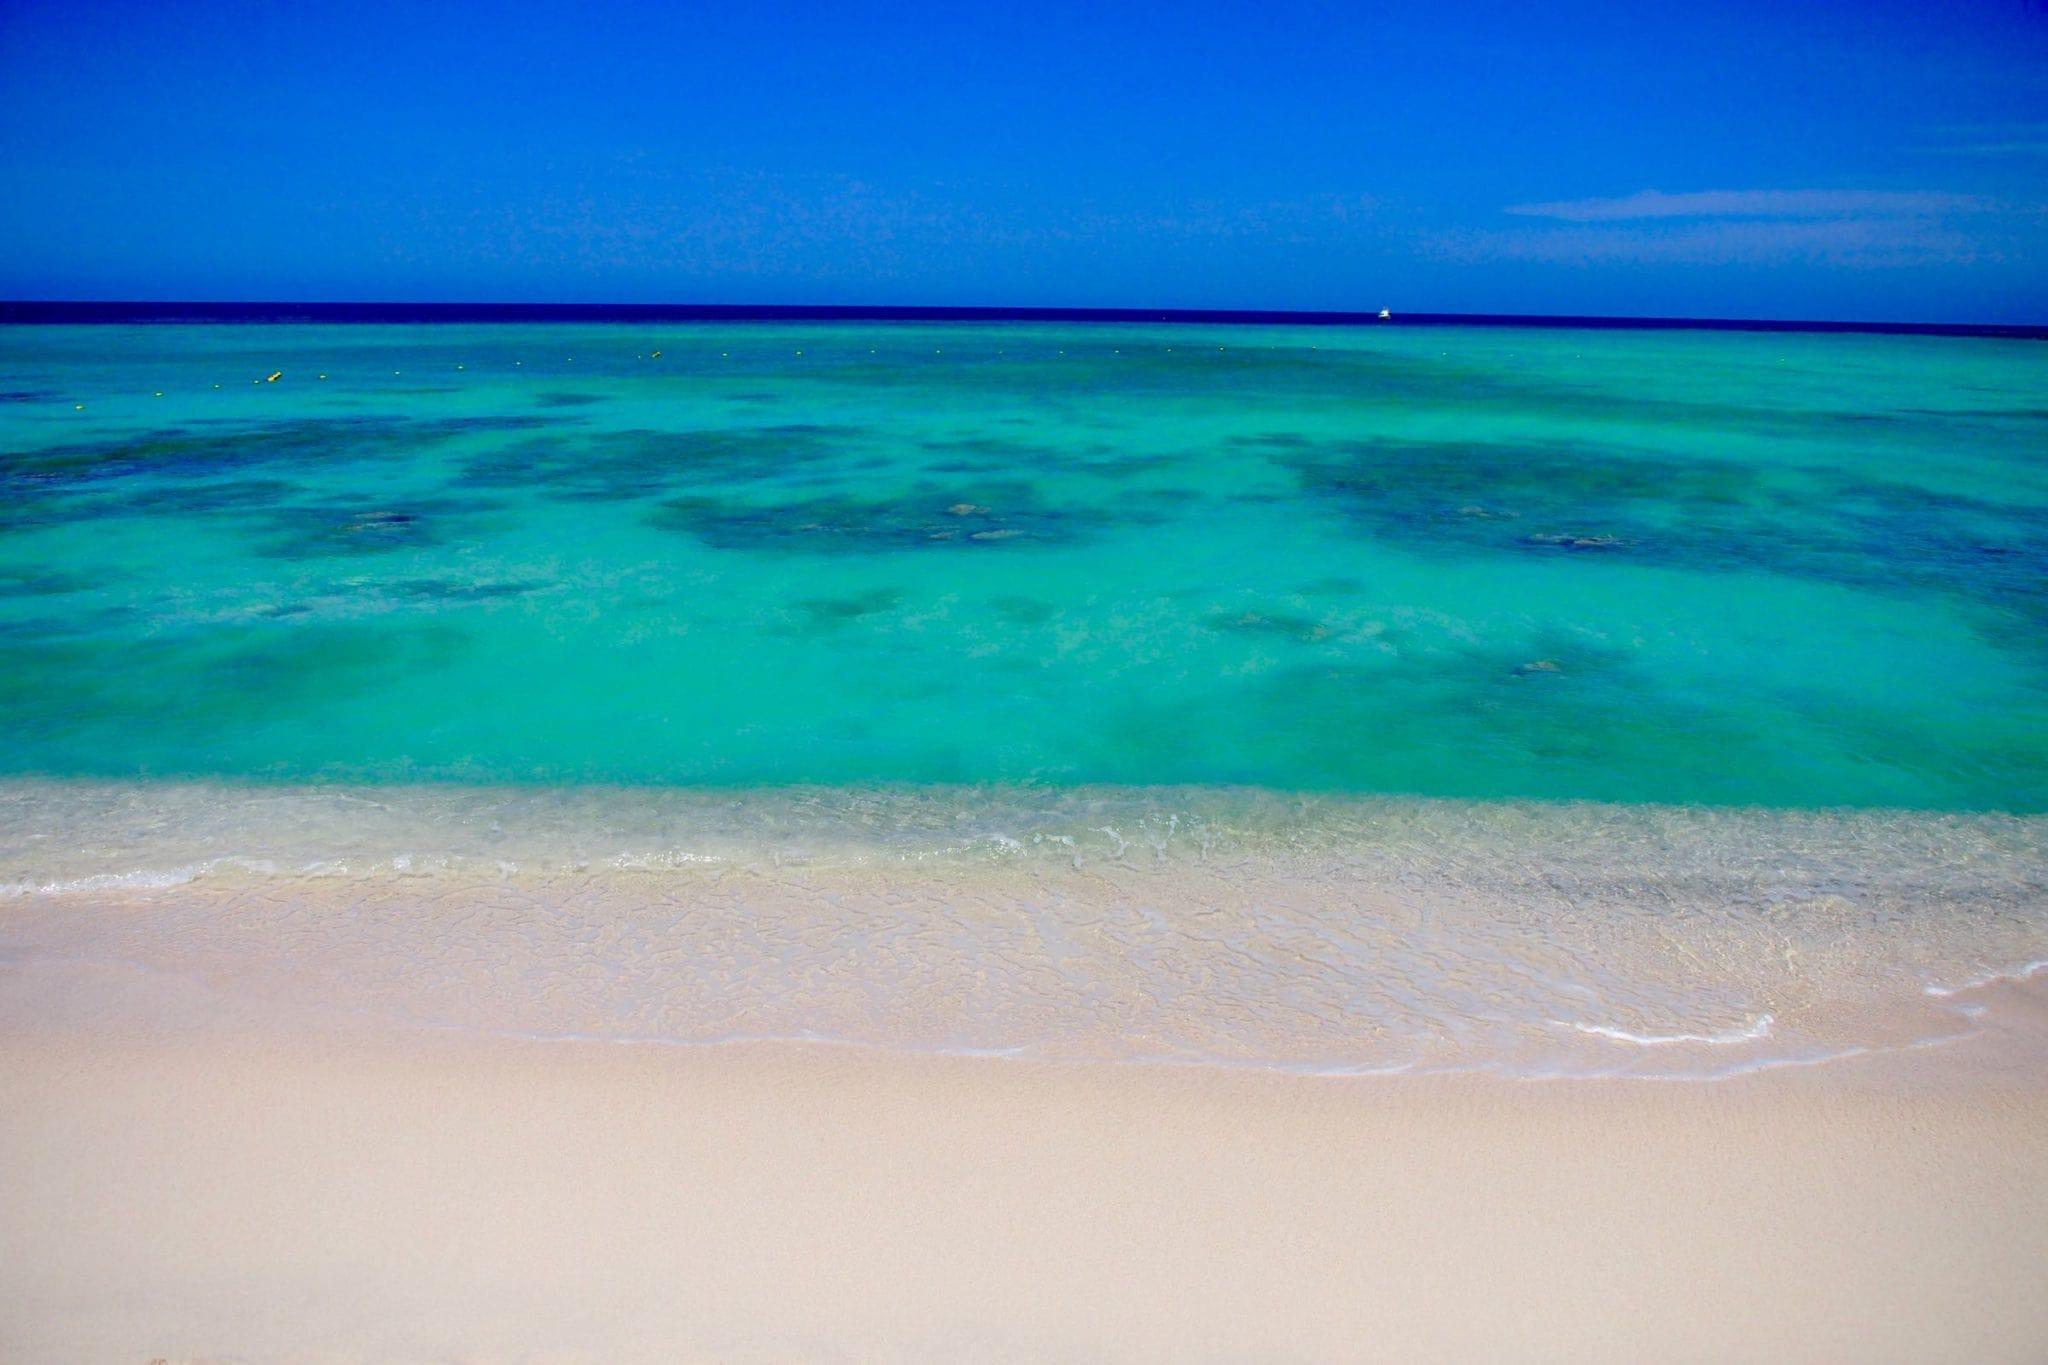 Arashi Beach - Image Credit: UncommonCaribbean.com